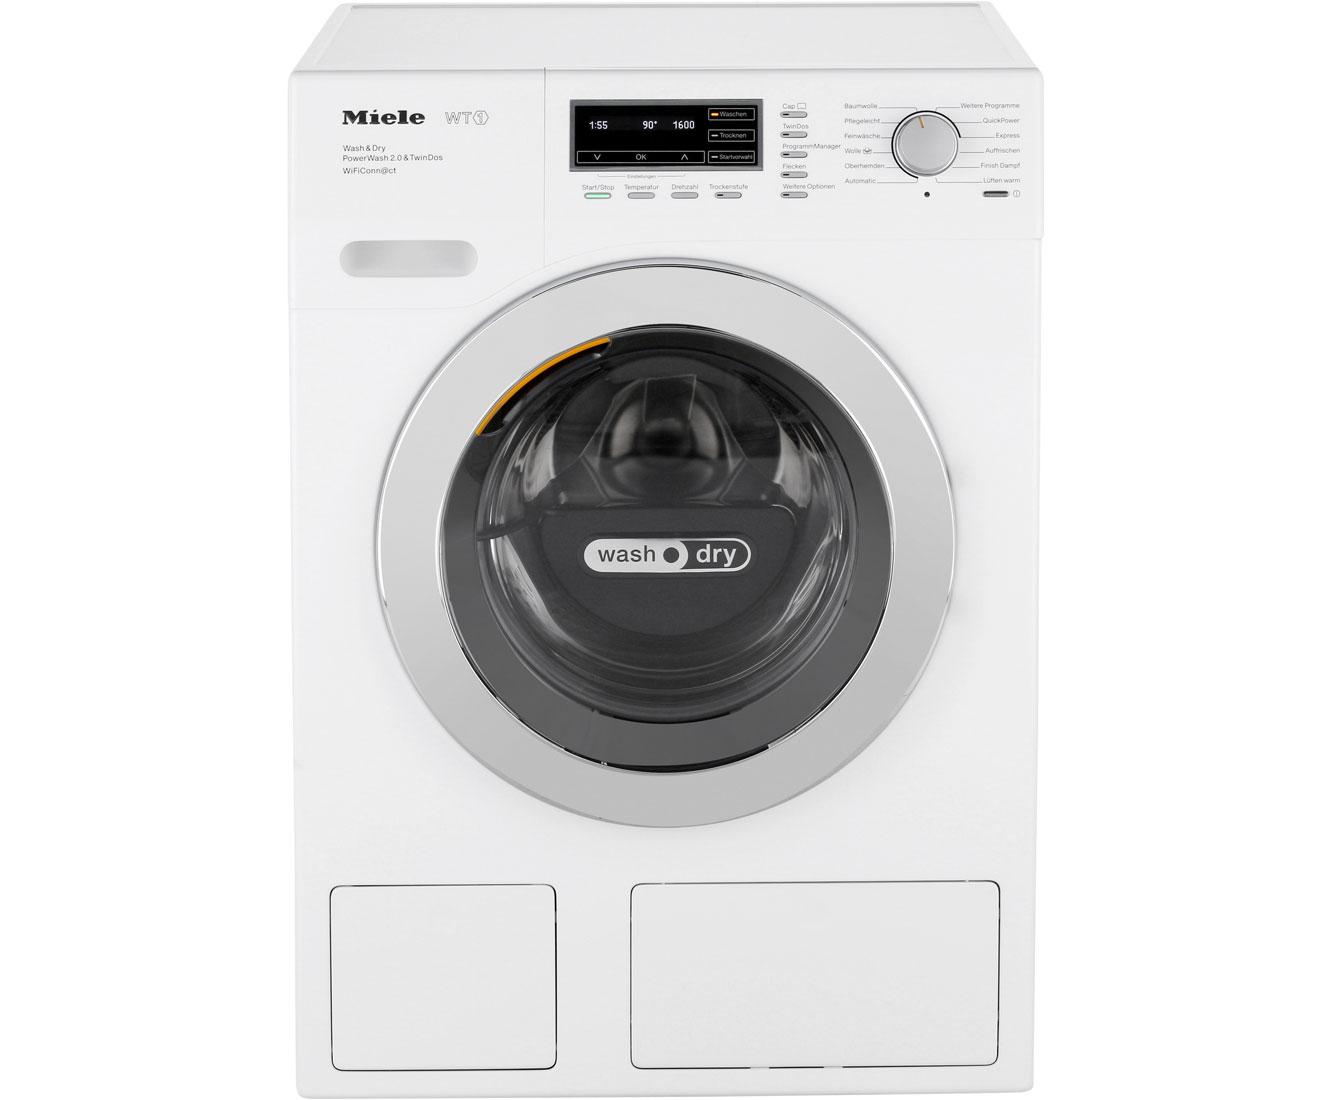 Miele WTH 730 WPM Waschtrockner